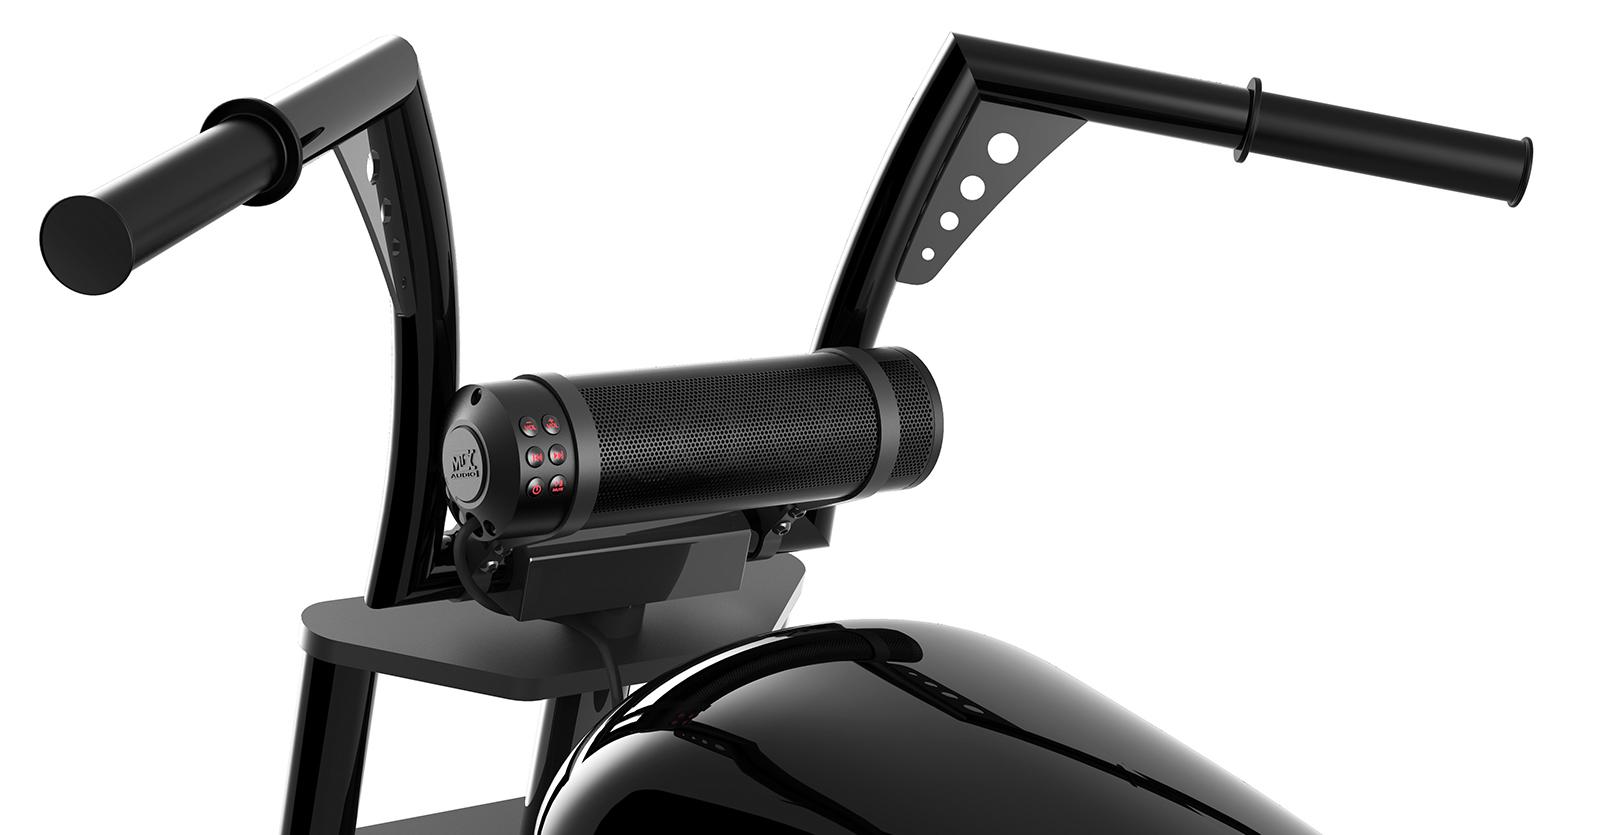 motorcycle sound system bluetooth speaker handlebar audio mtx bar handle mount speakers universal bars weather fairing wireless utv motorcycles bike